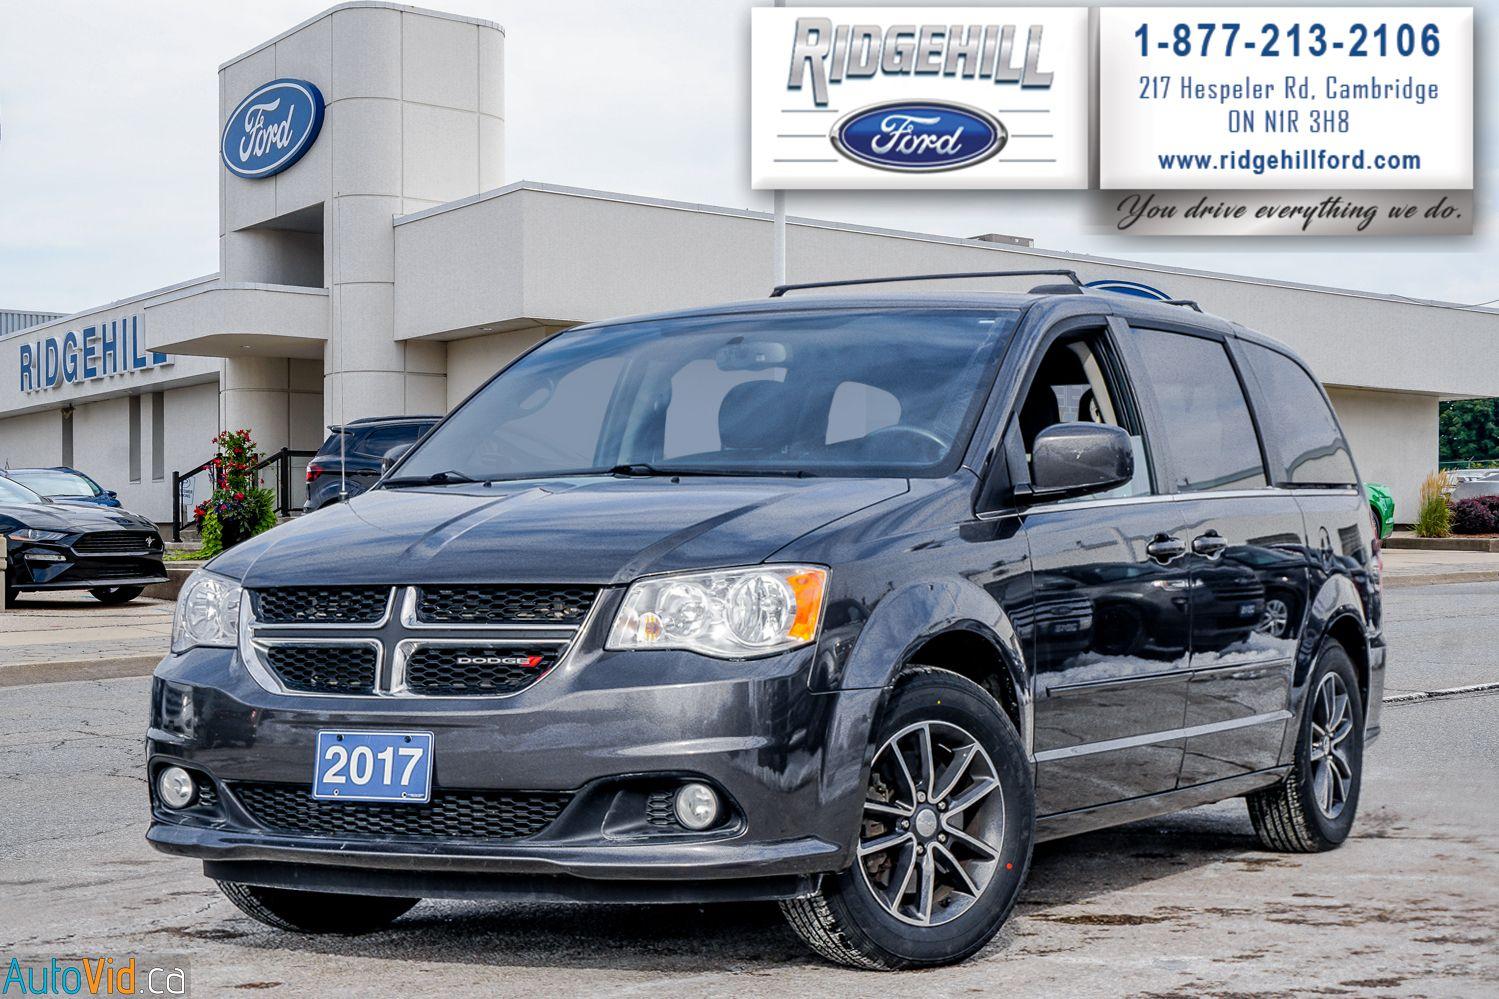 2017 Dodge Grand Caravan Image